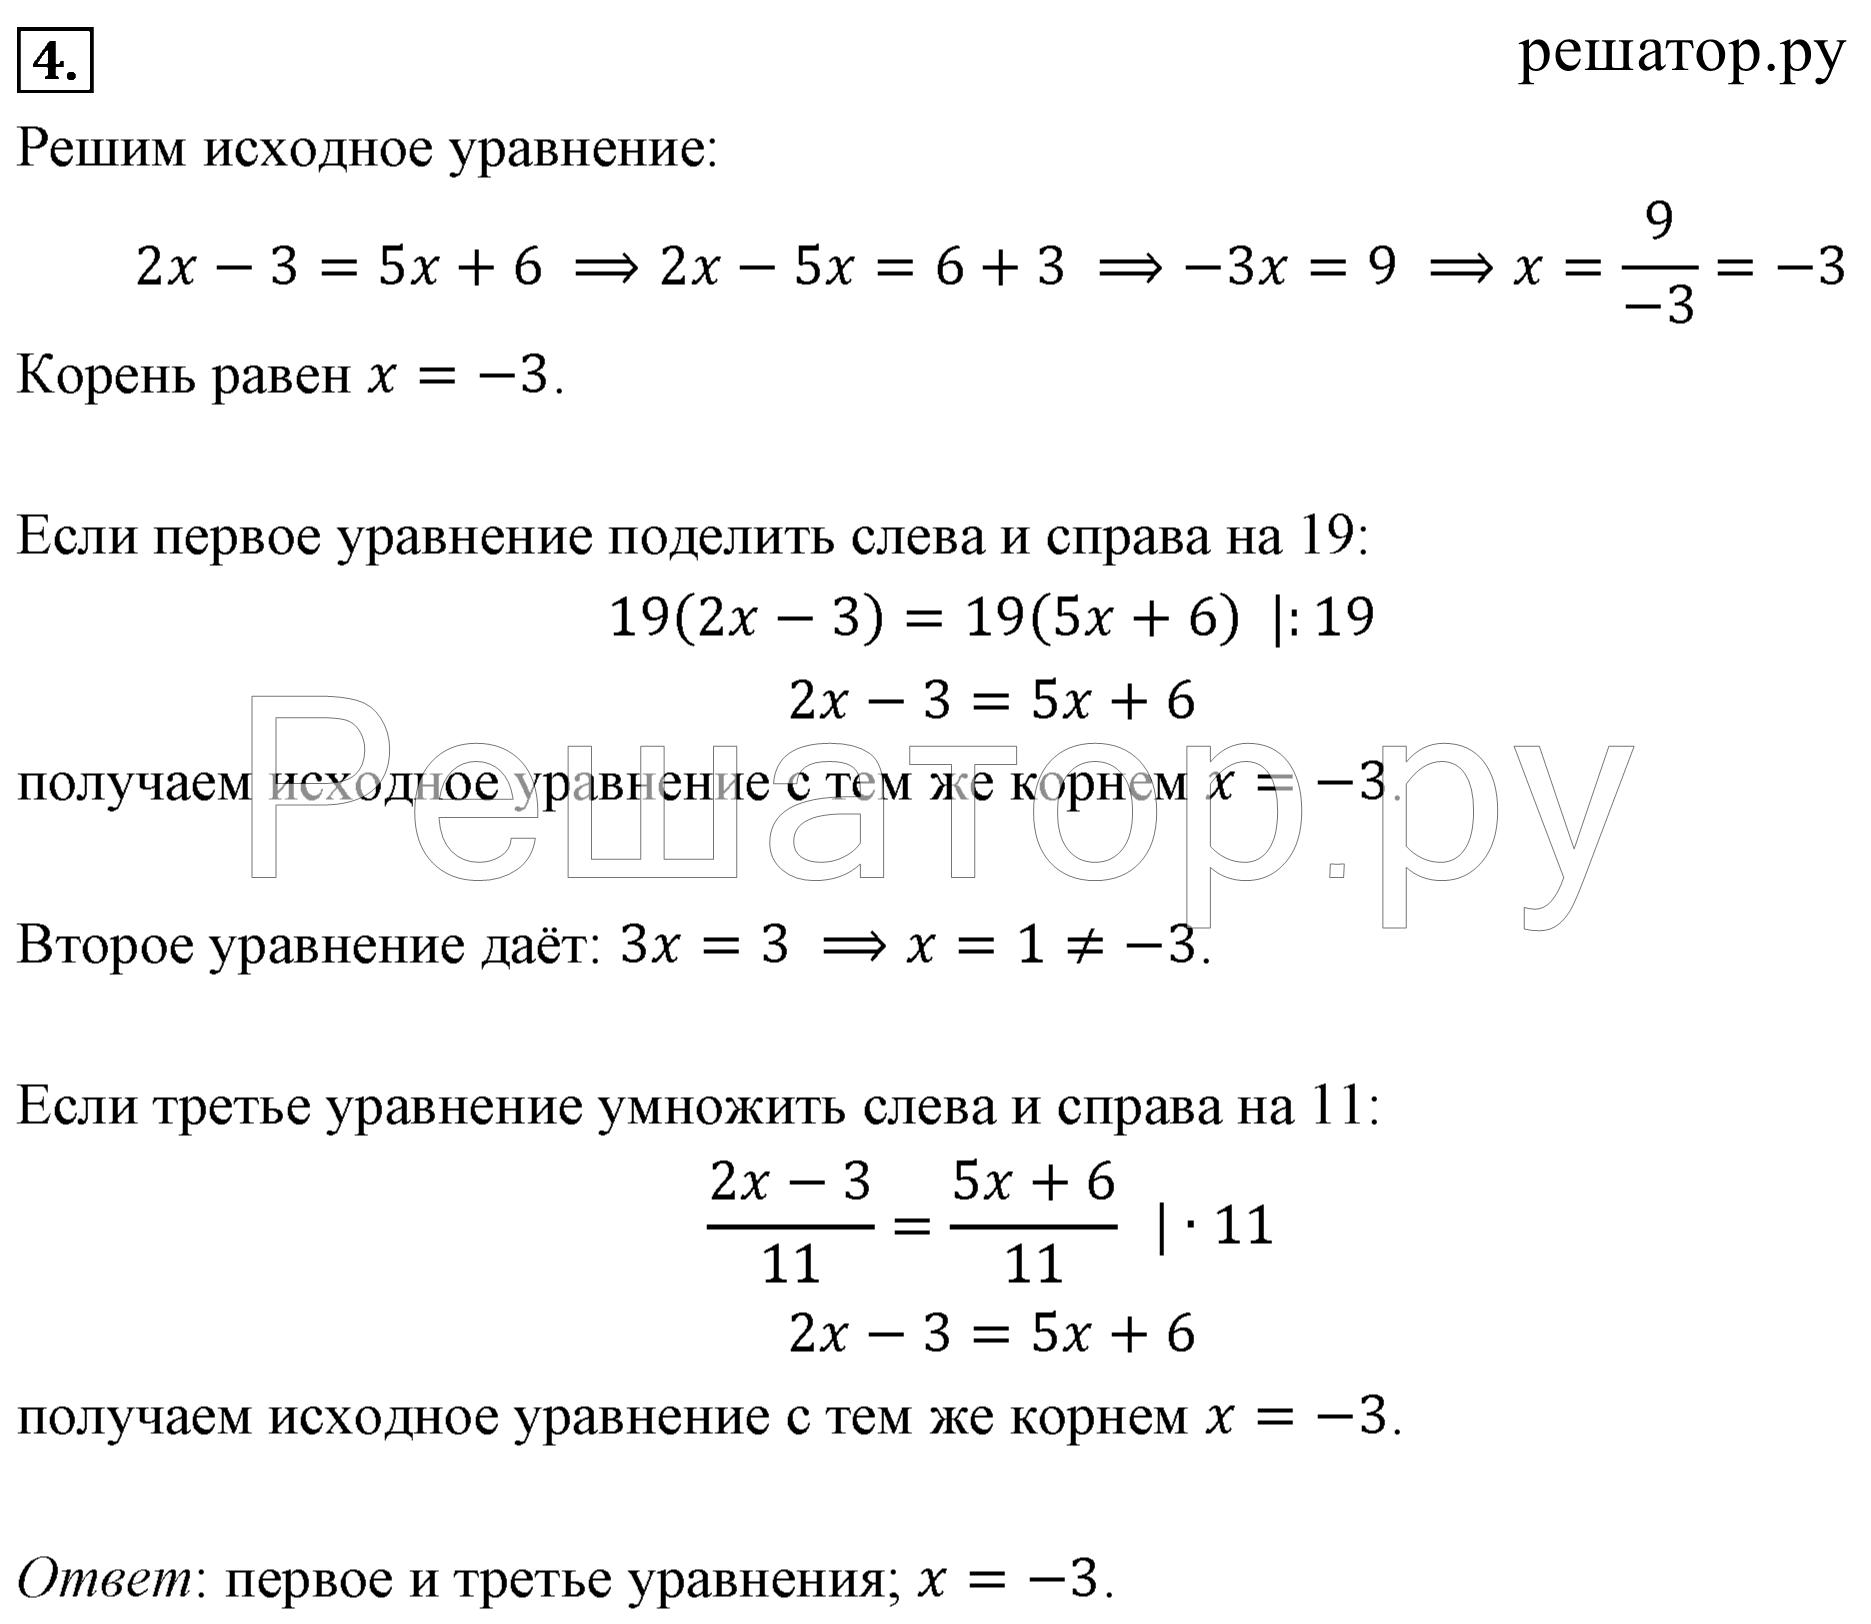 Решение уравнений онлайн 4 класс